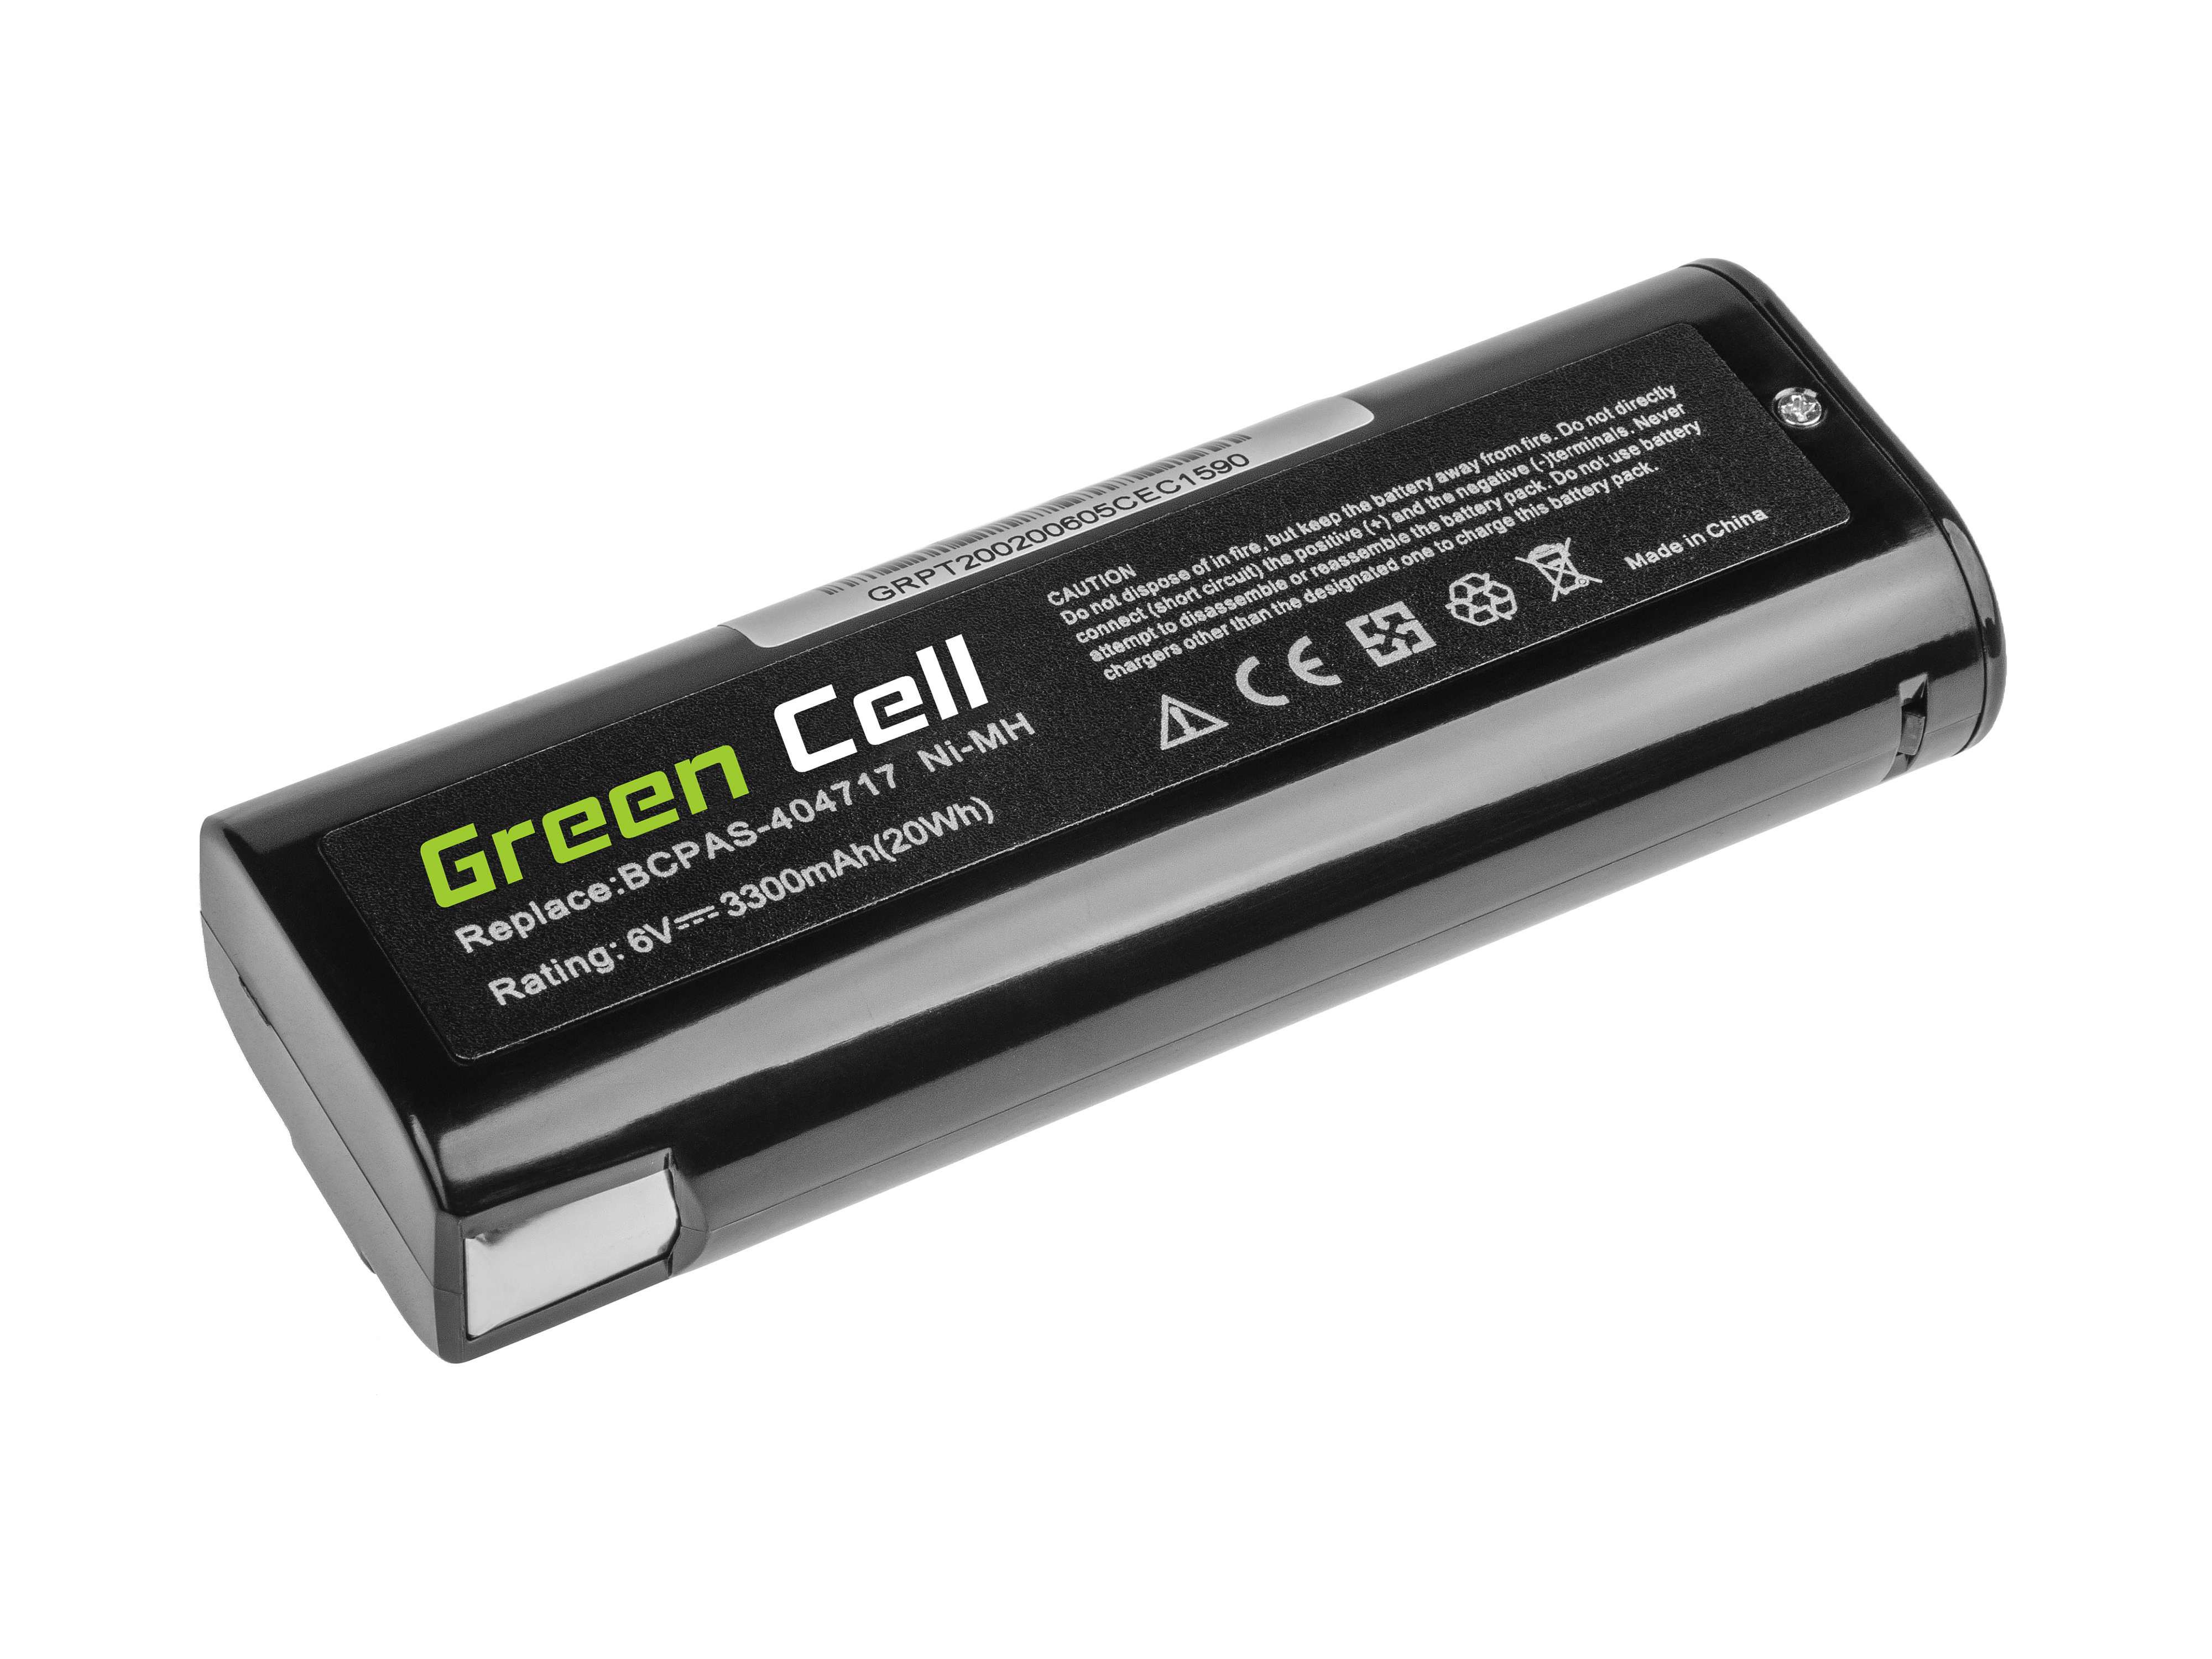 Baterie Green Cell Paslode IMCT IM50 IM65 IM200 IM250 IM300 IM325 IM350 6V 3300mAh Ni-MH – neoriginální